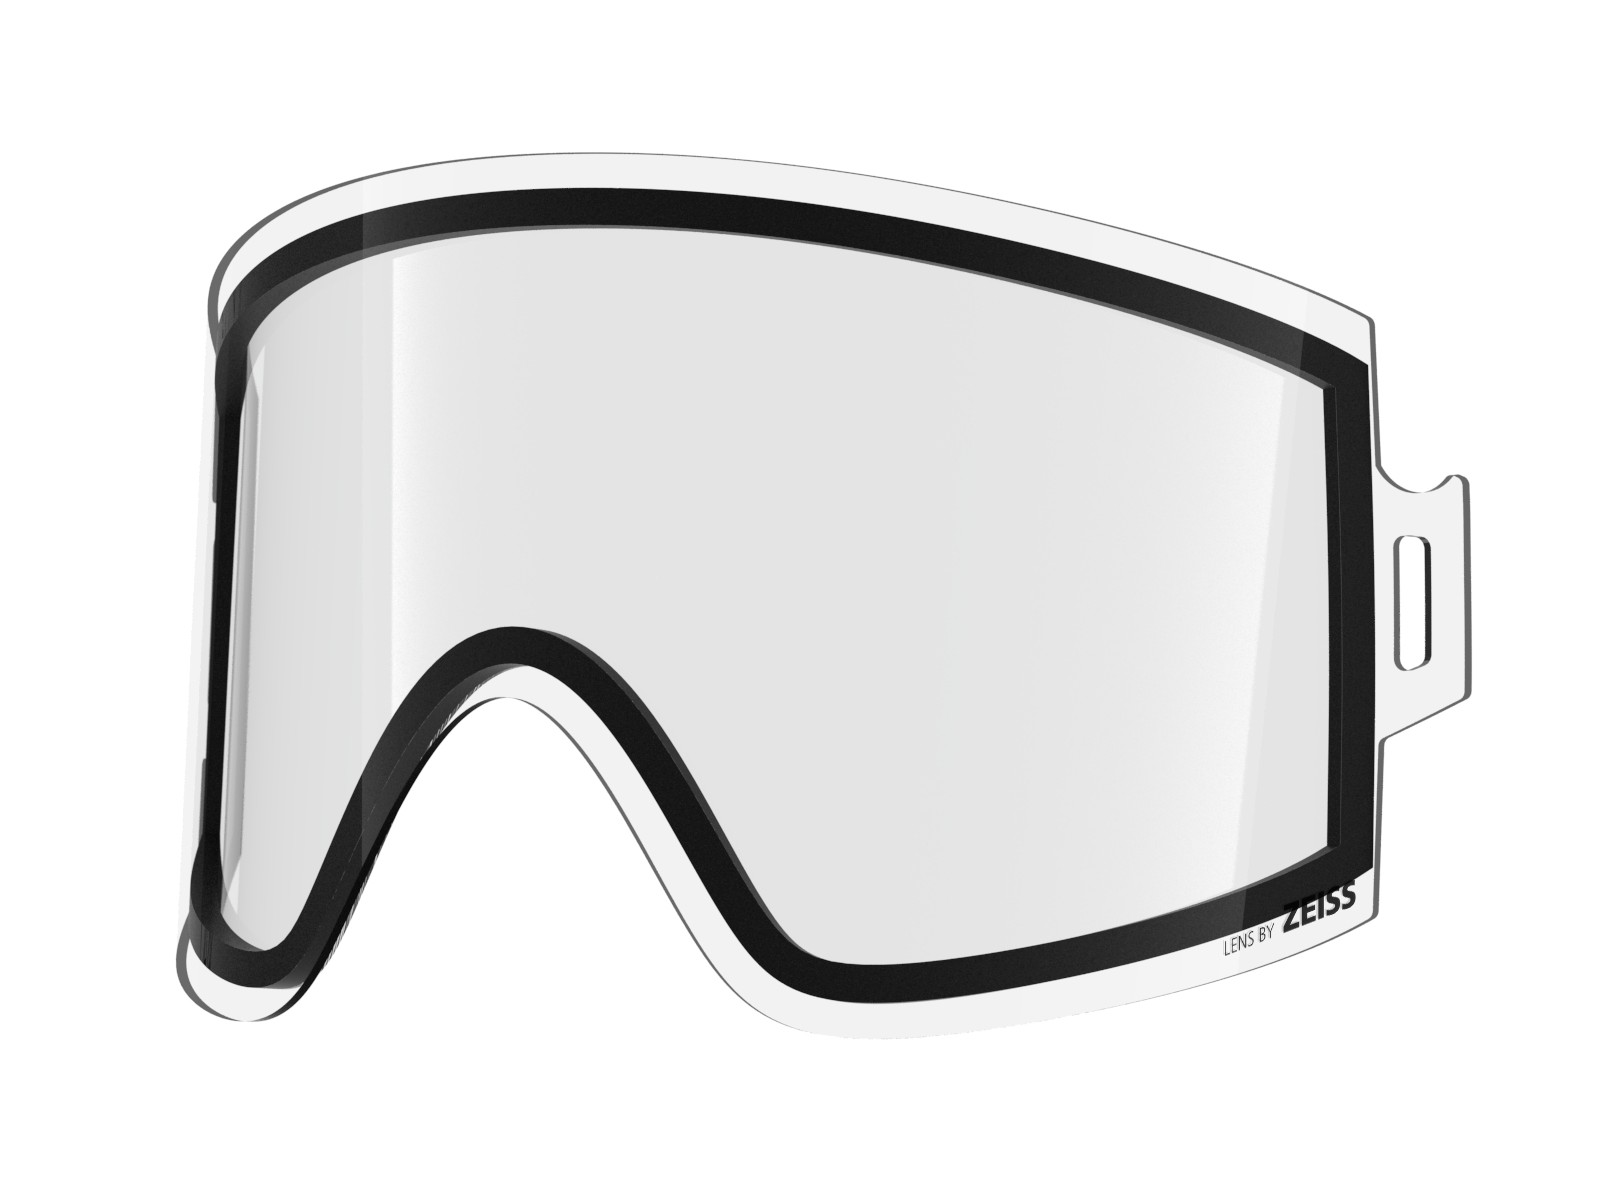 Clear lens for Lente per Katana goggle